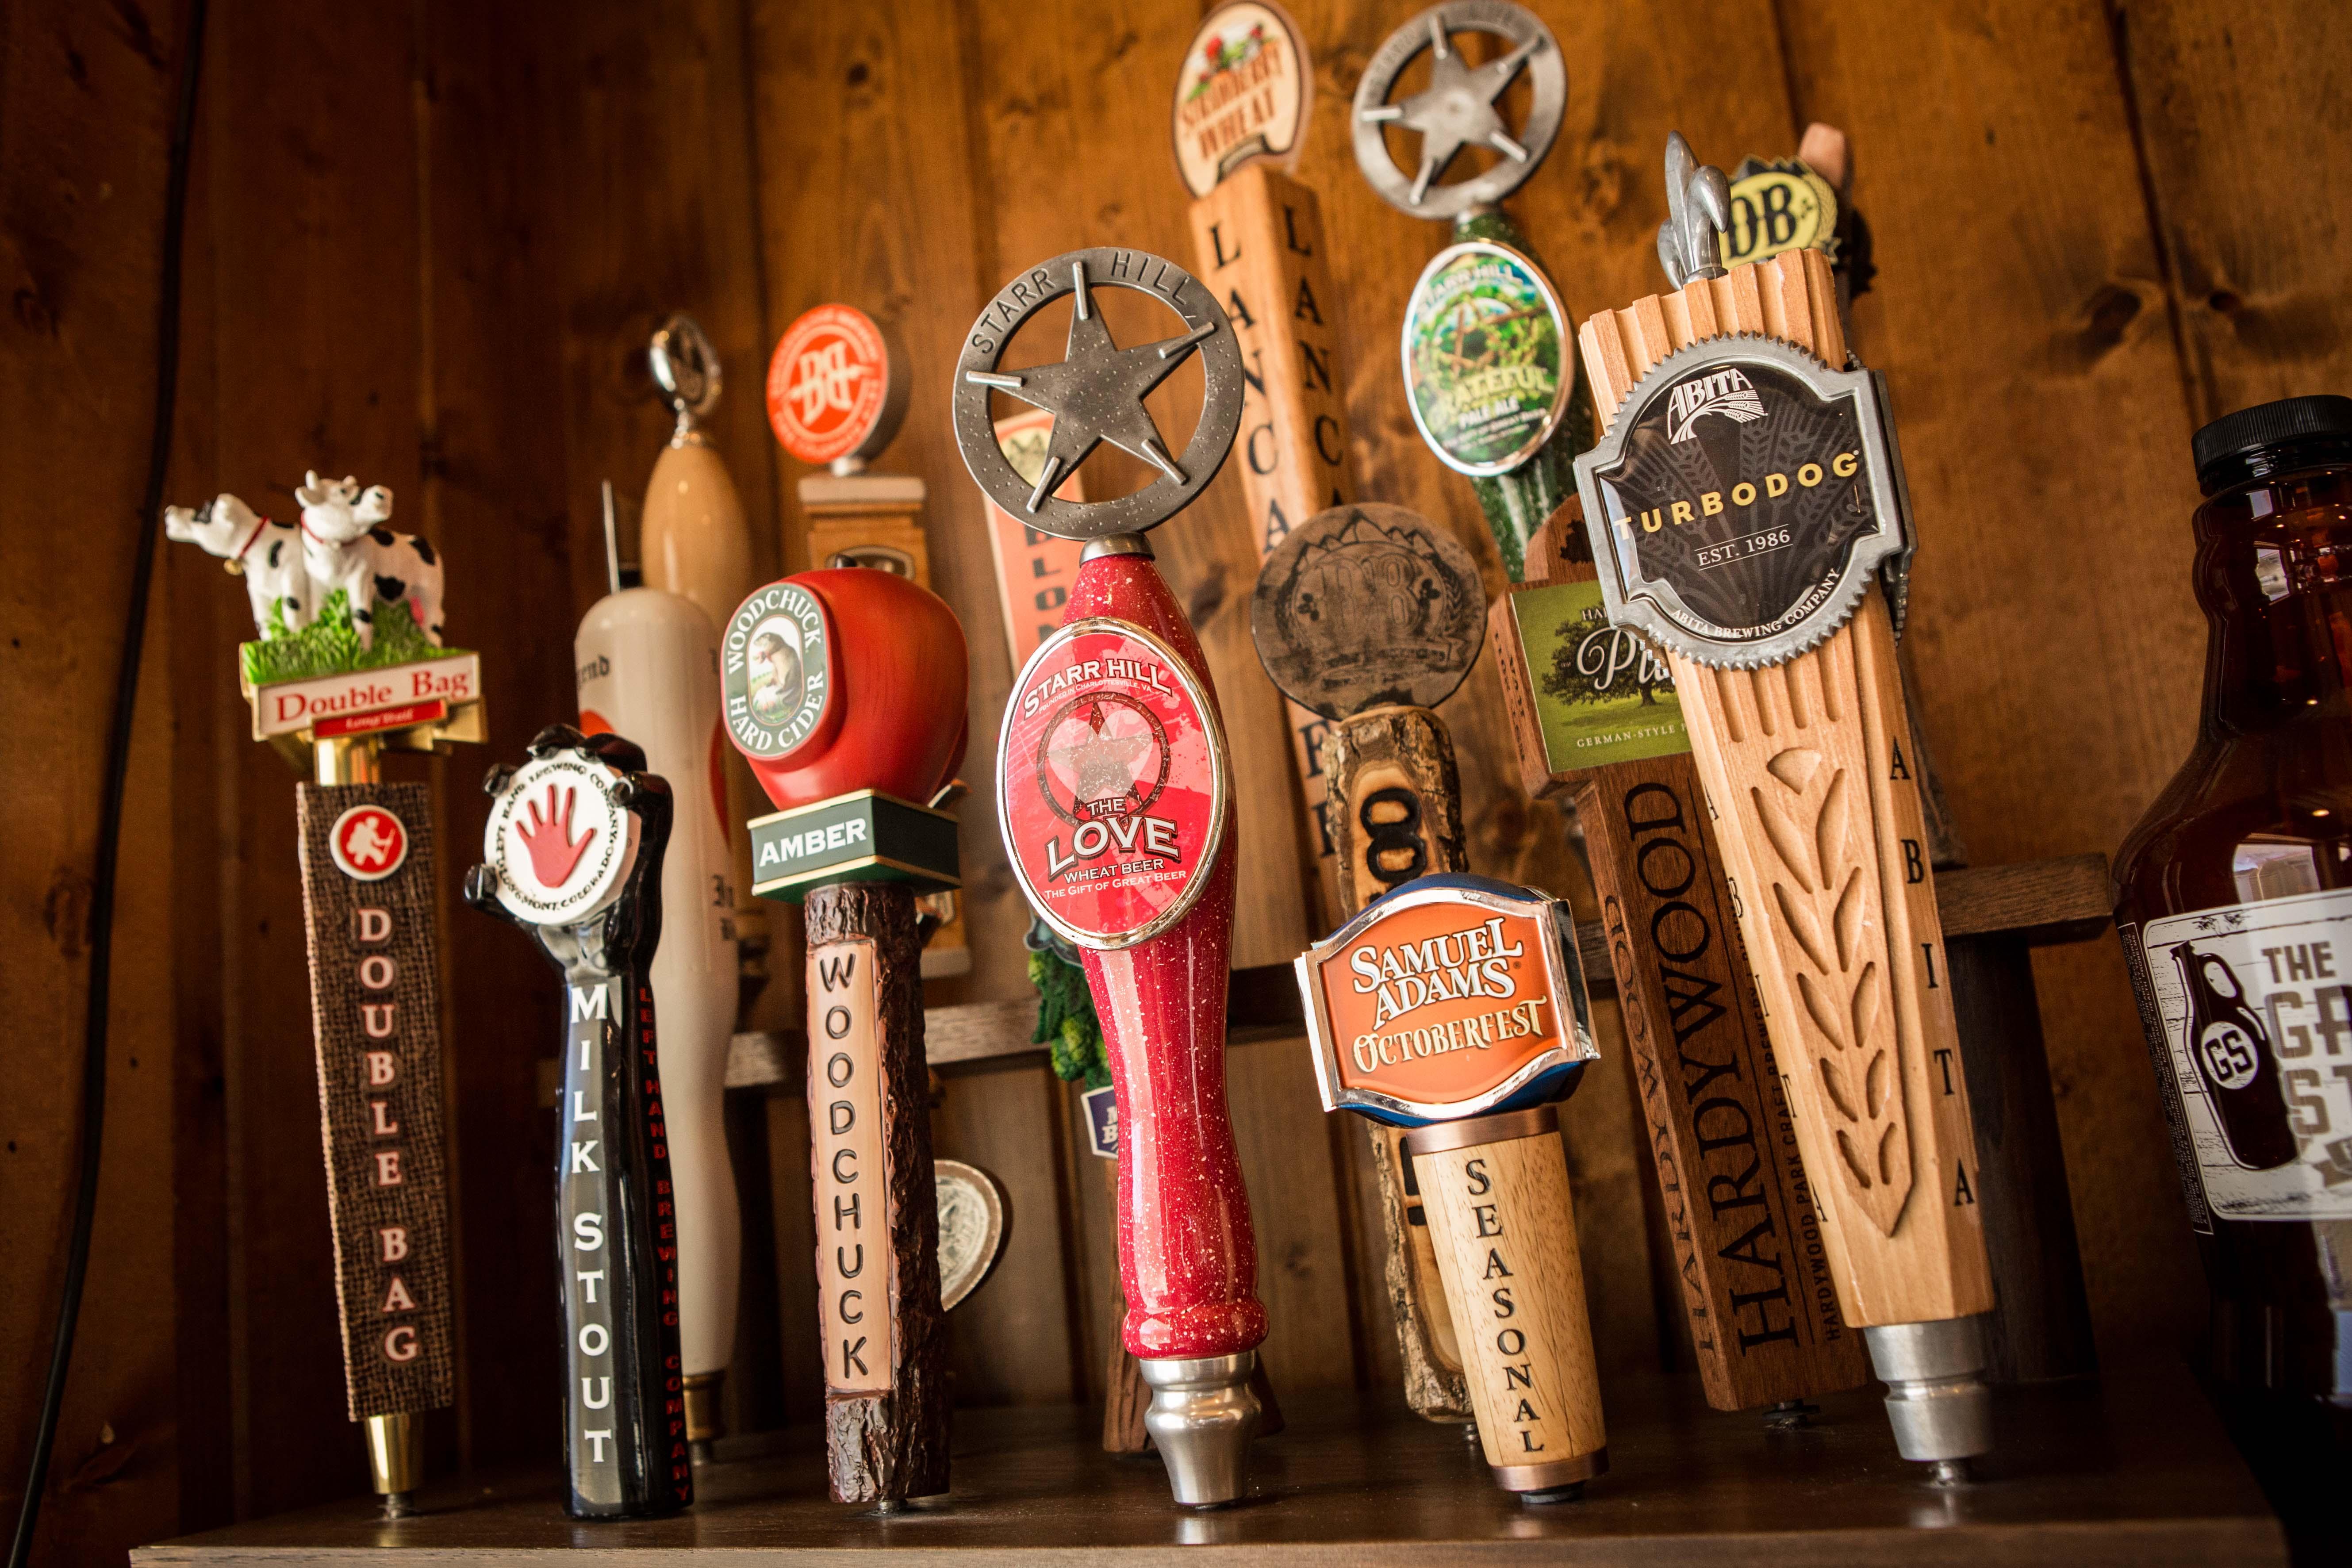 growler beer gas station staunto.jpg